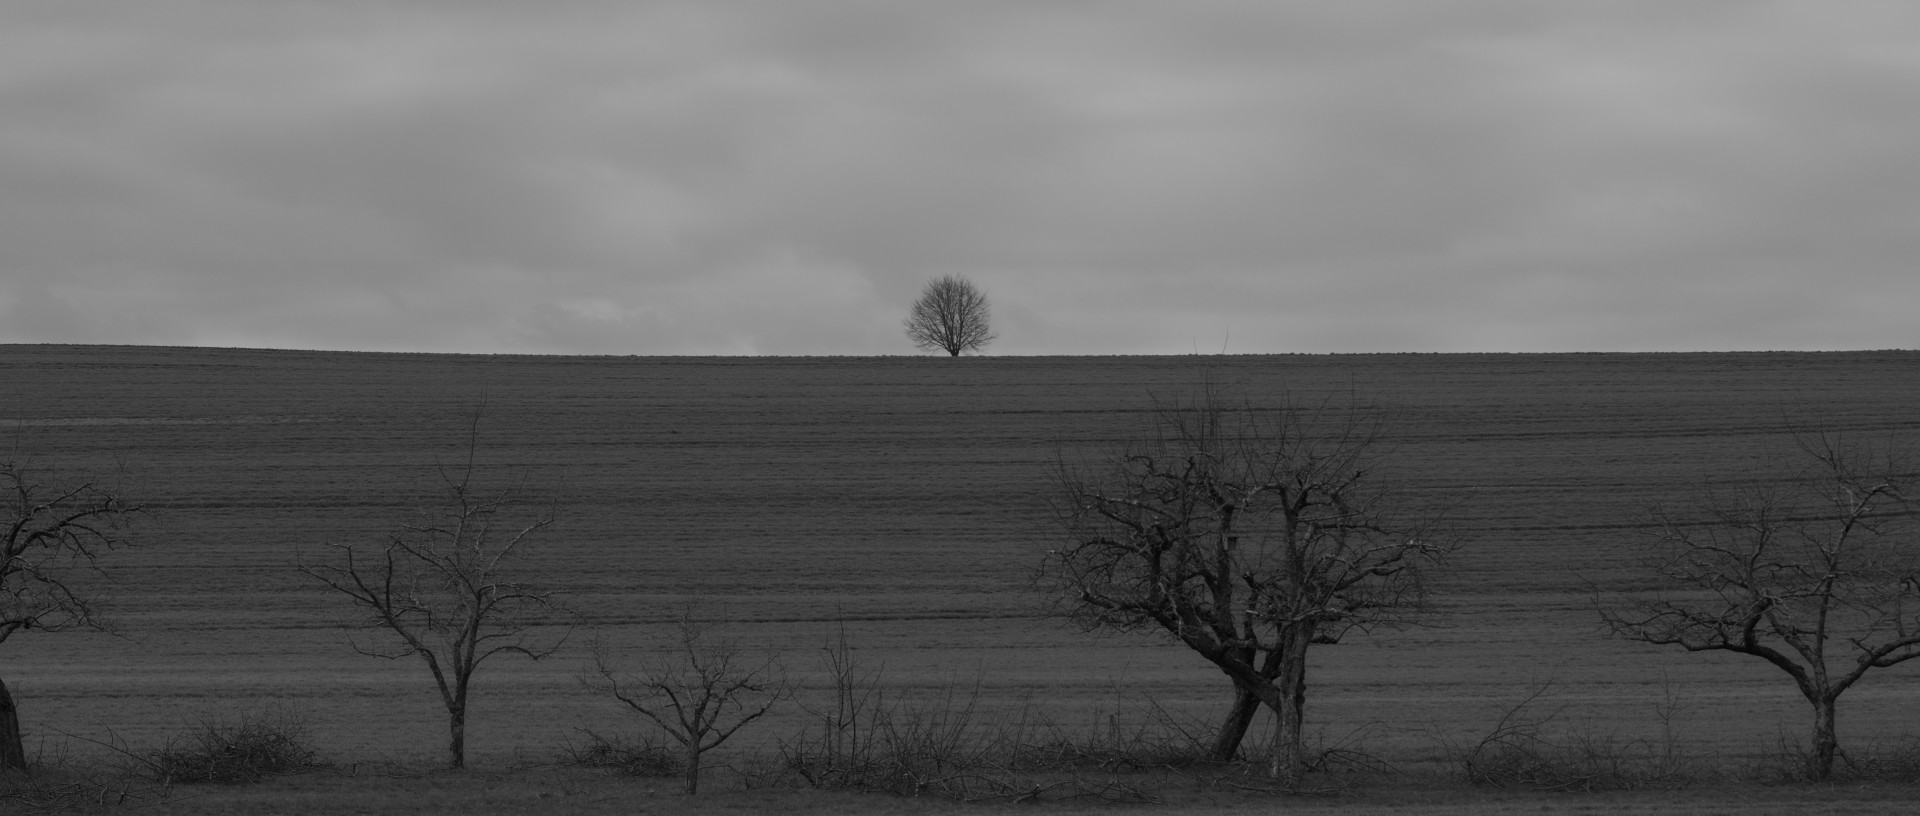 widescreen tree, b/w, sky background